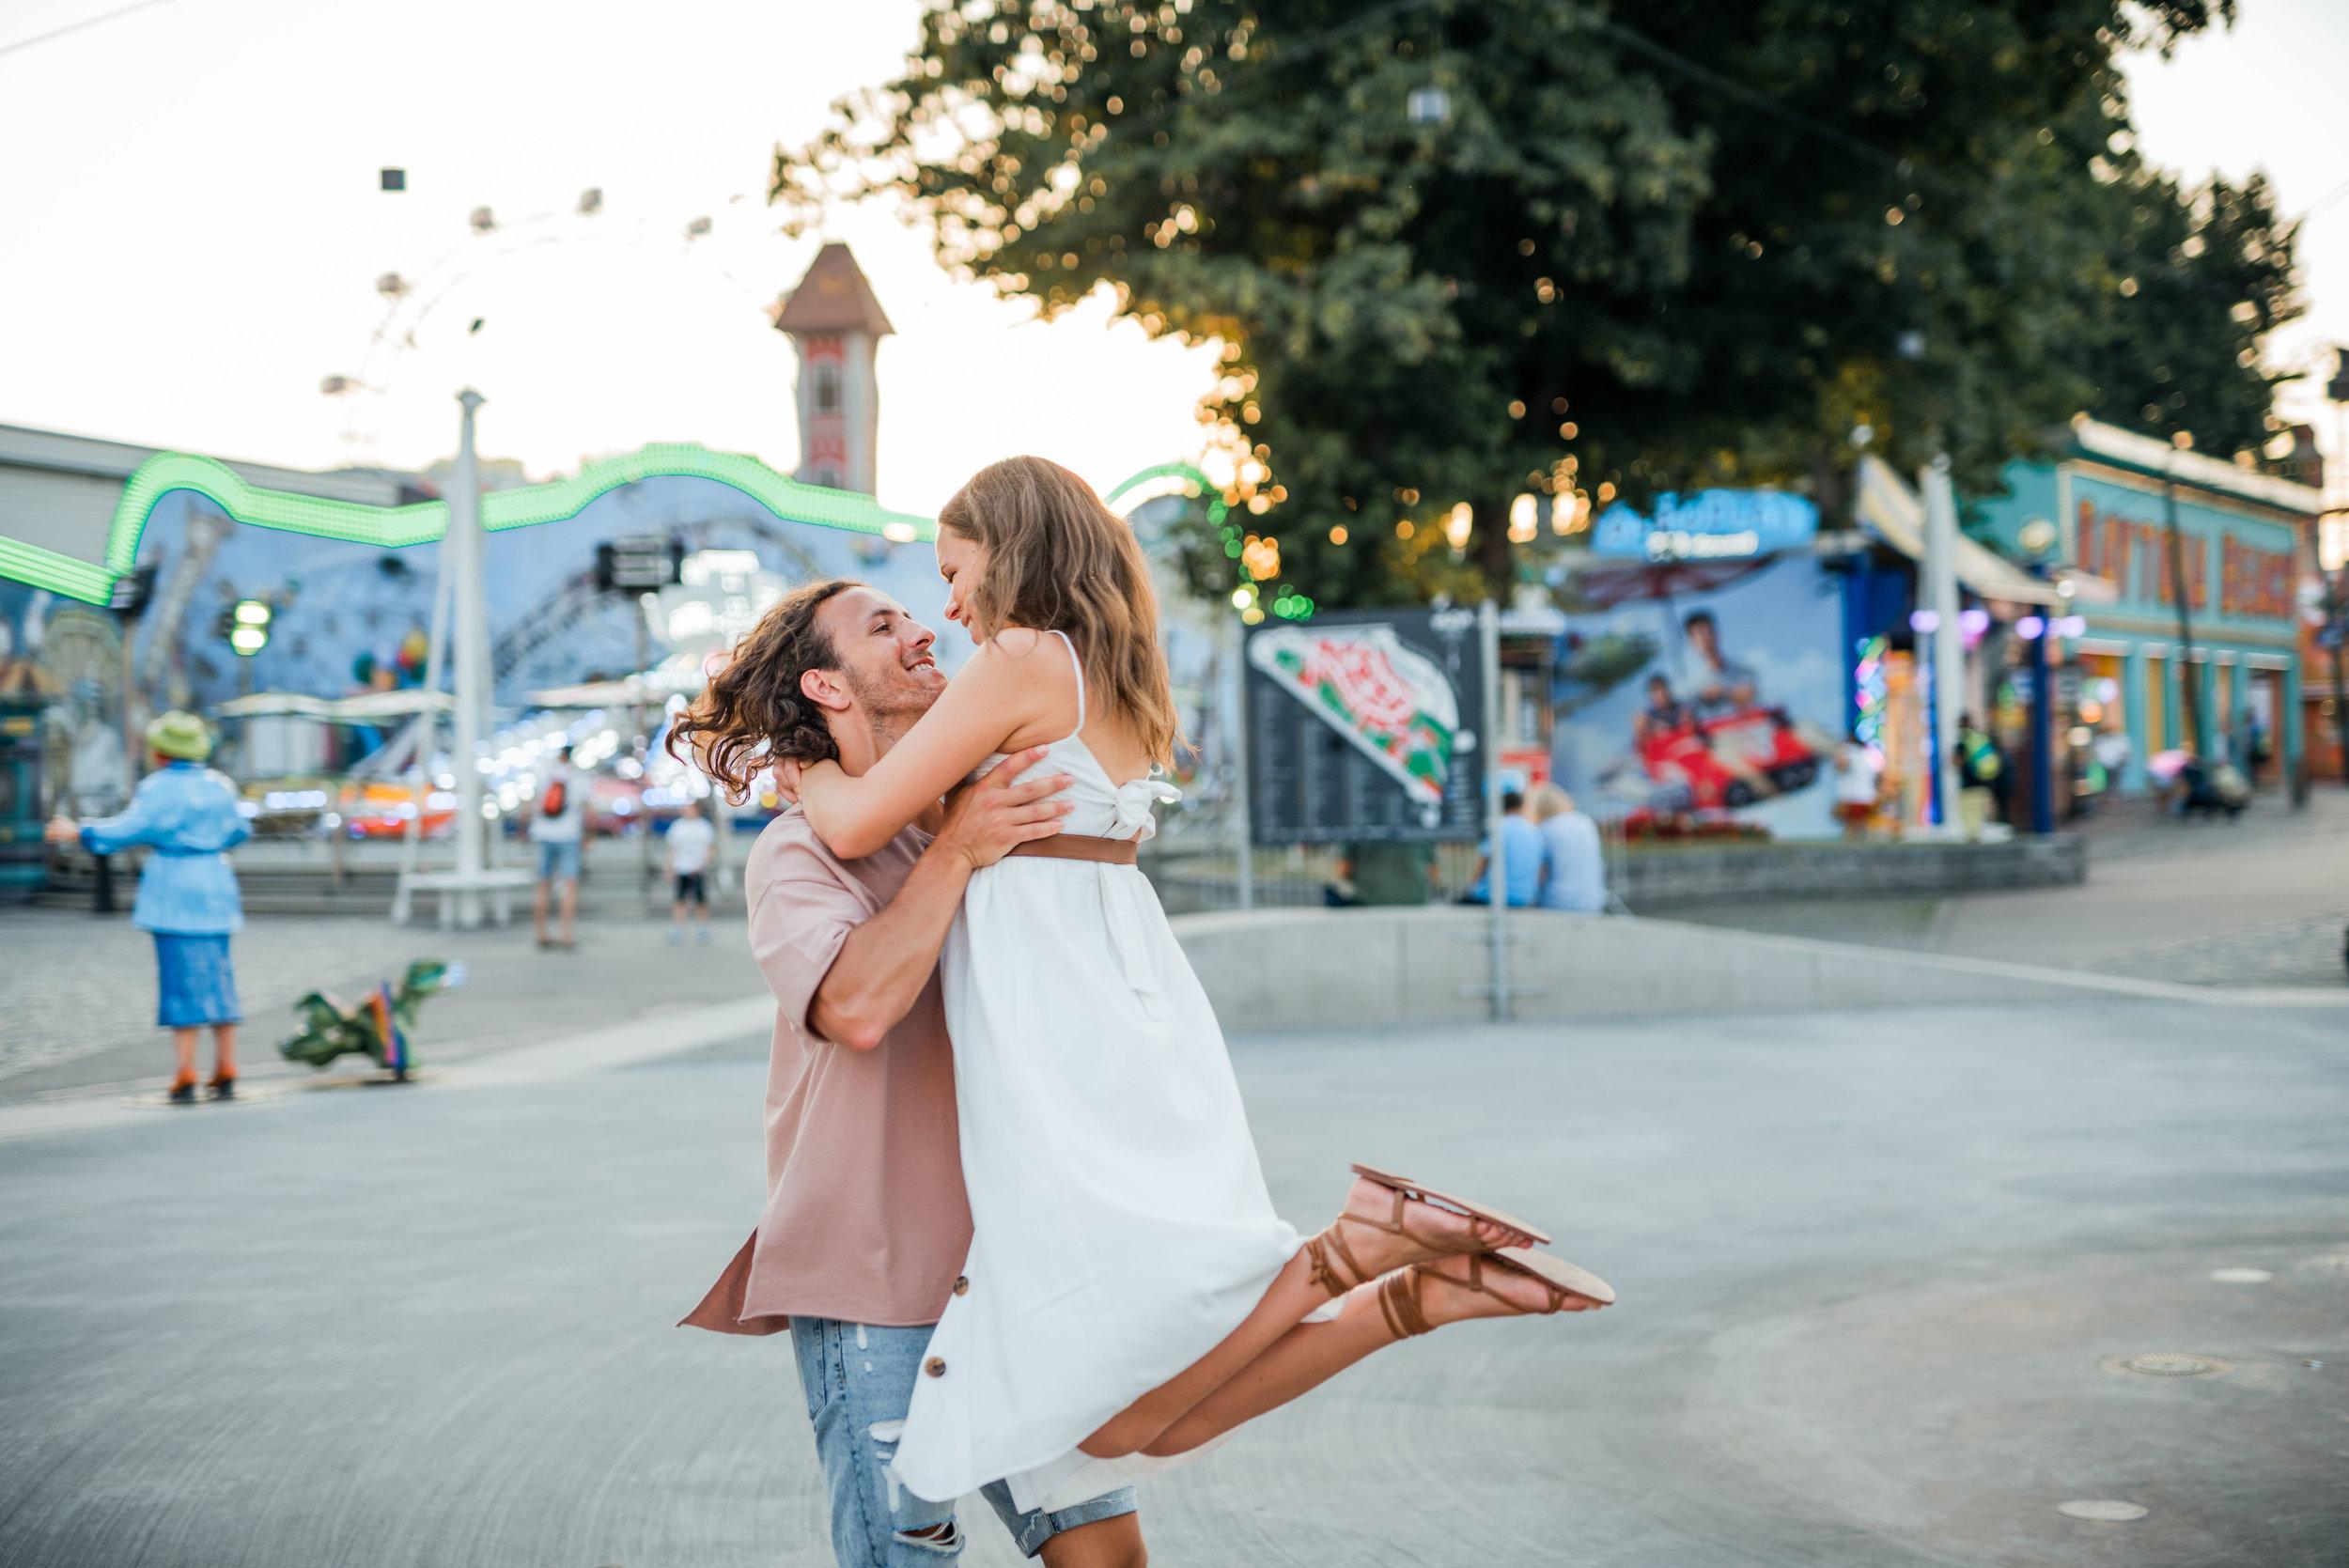 Verlobungsshooting im Prater - Engagement